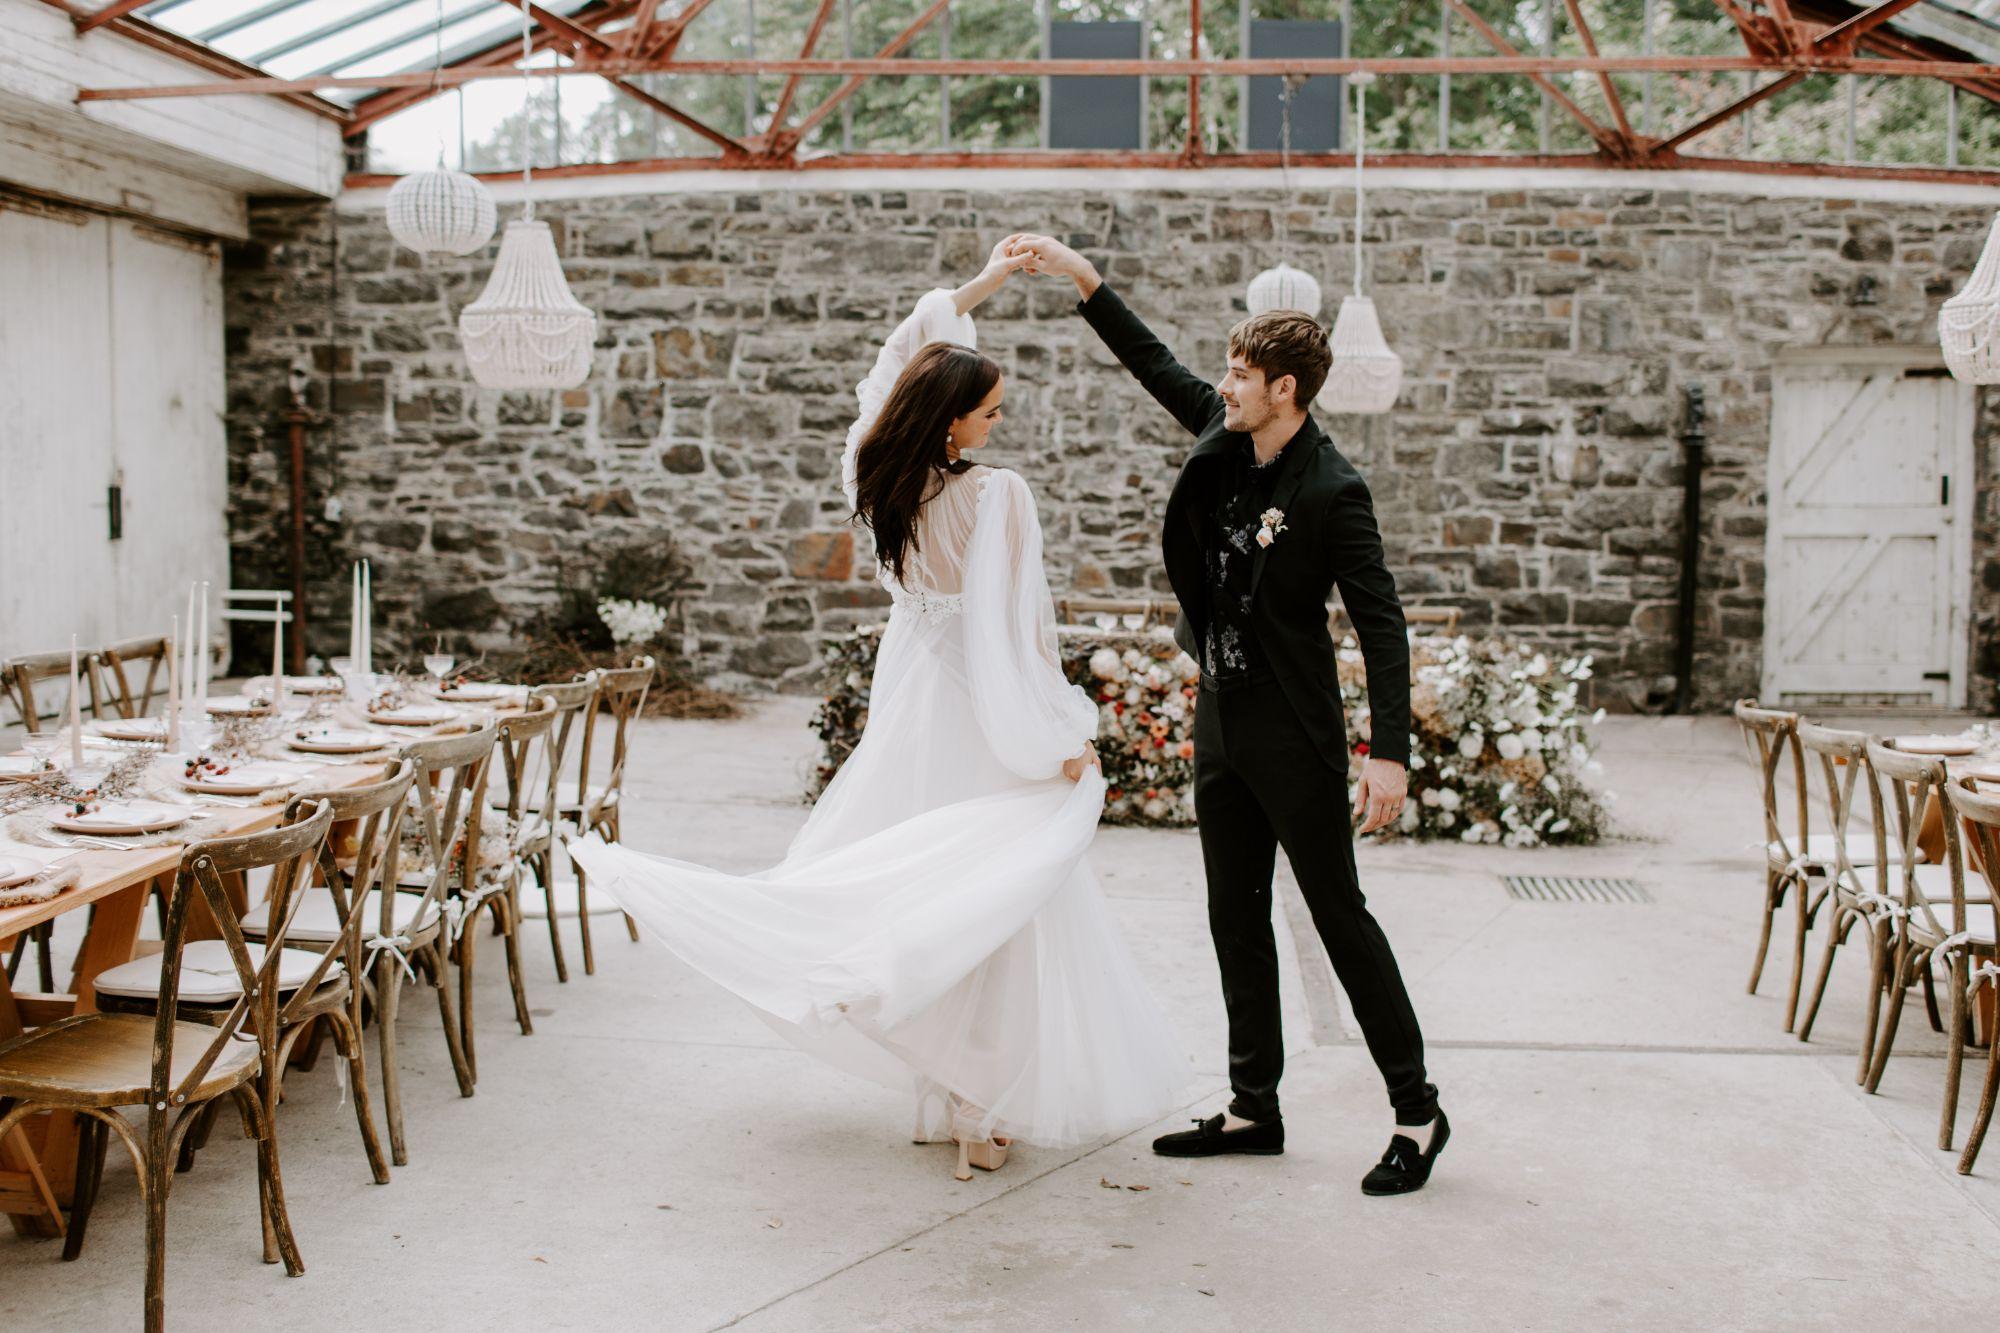 Wedding_Photography_Becky_Tranter-99.jpg